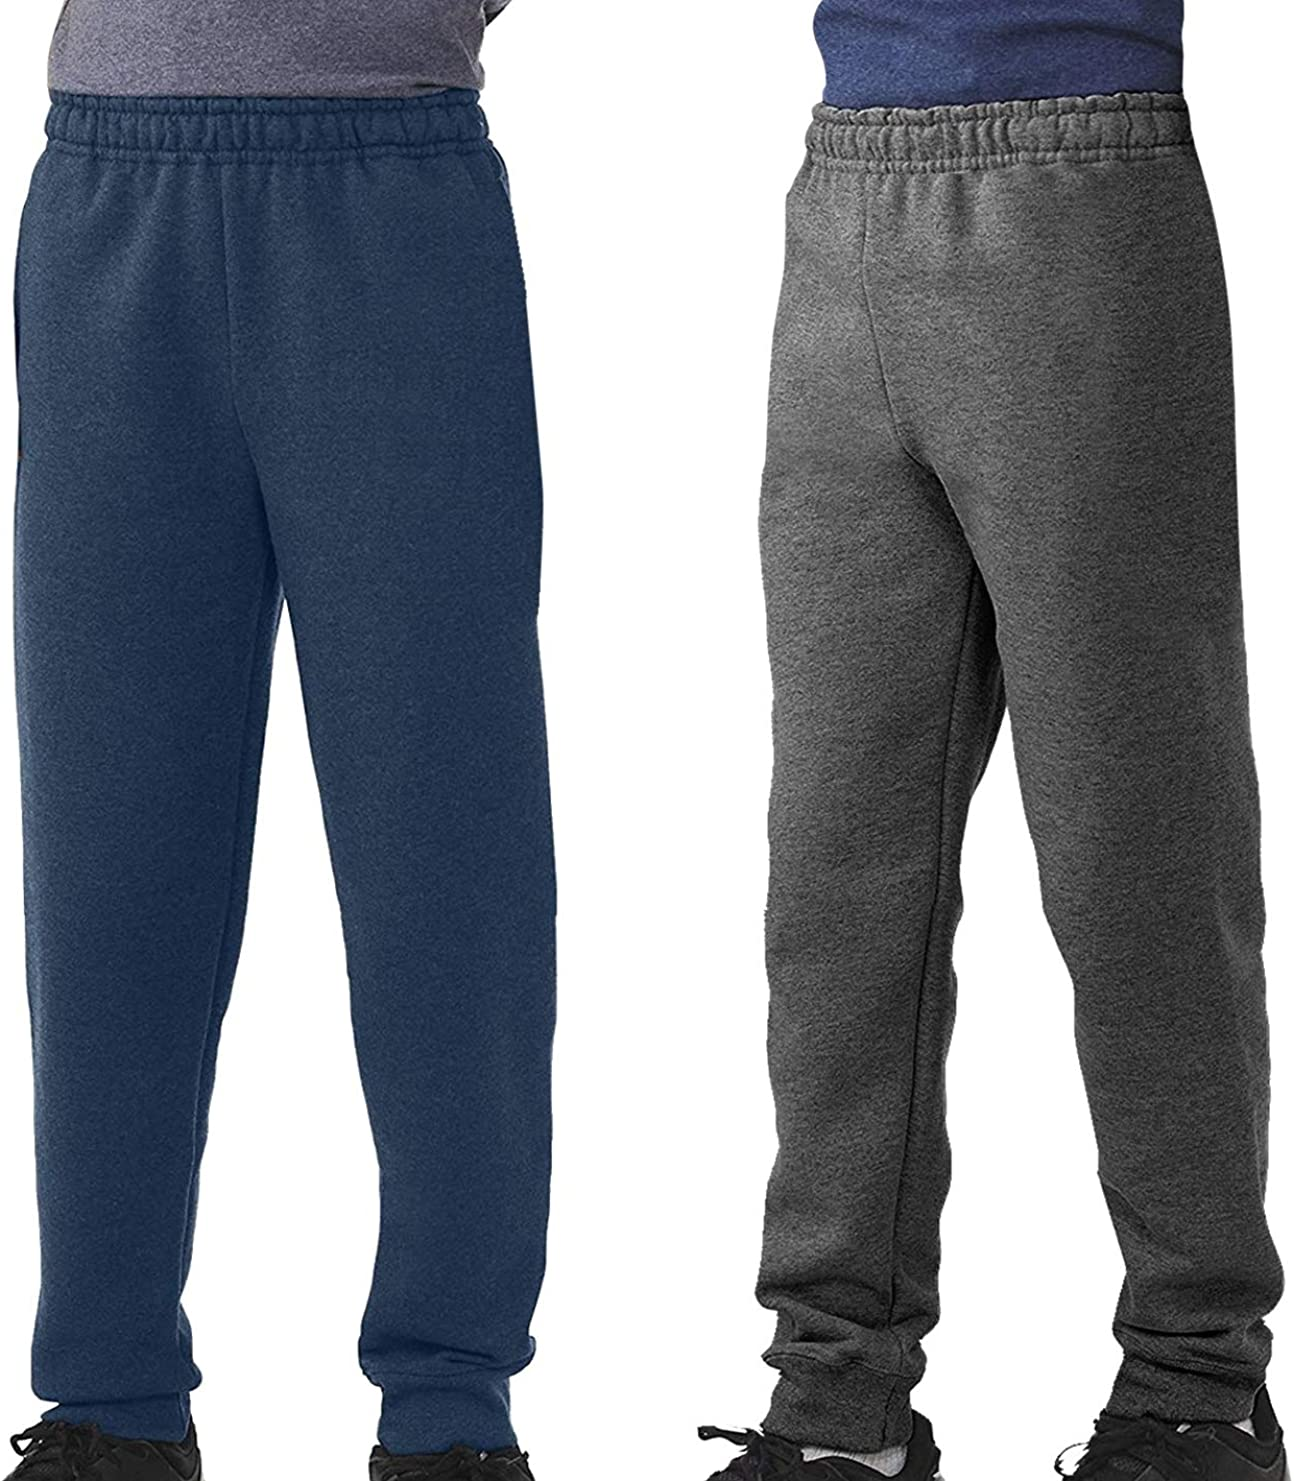 TEXFIT 2-Pack 8-16yrs Boys Jogger Pants 2pcs Set Fleece Sweatpants